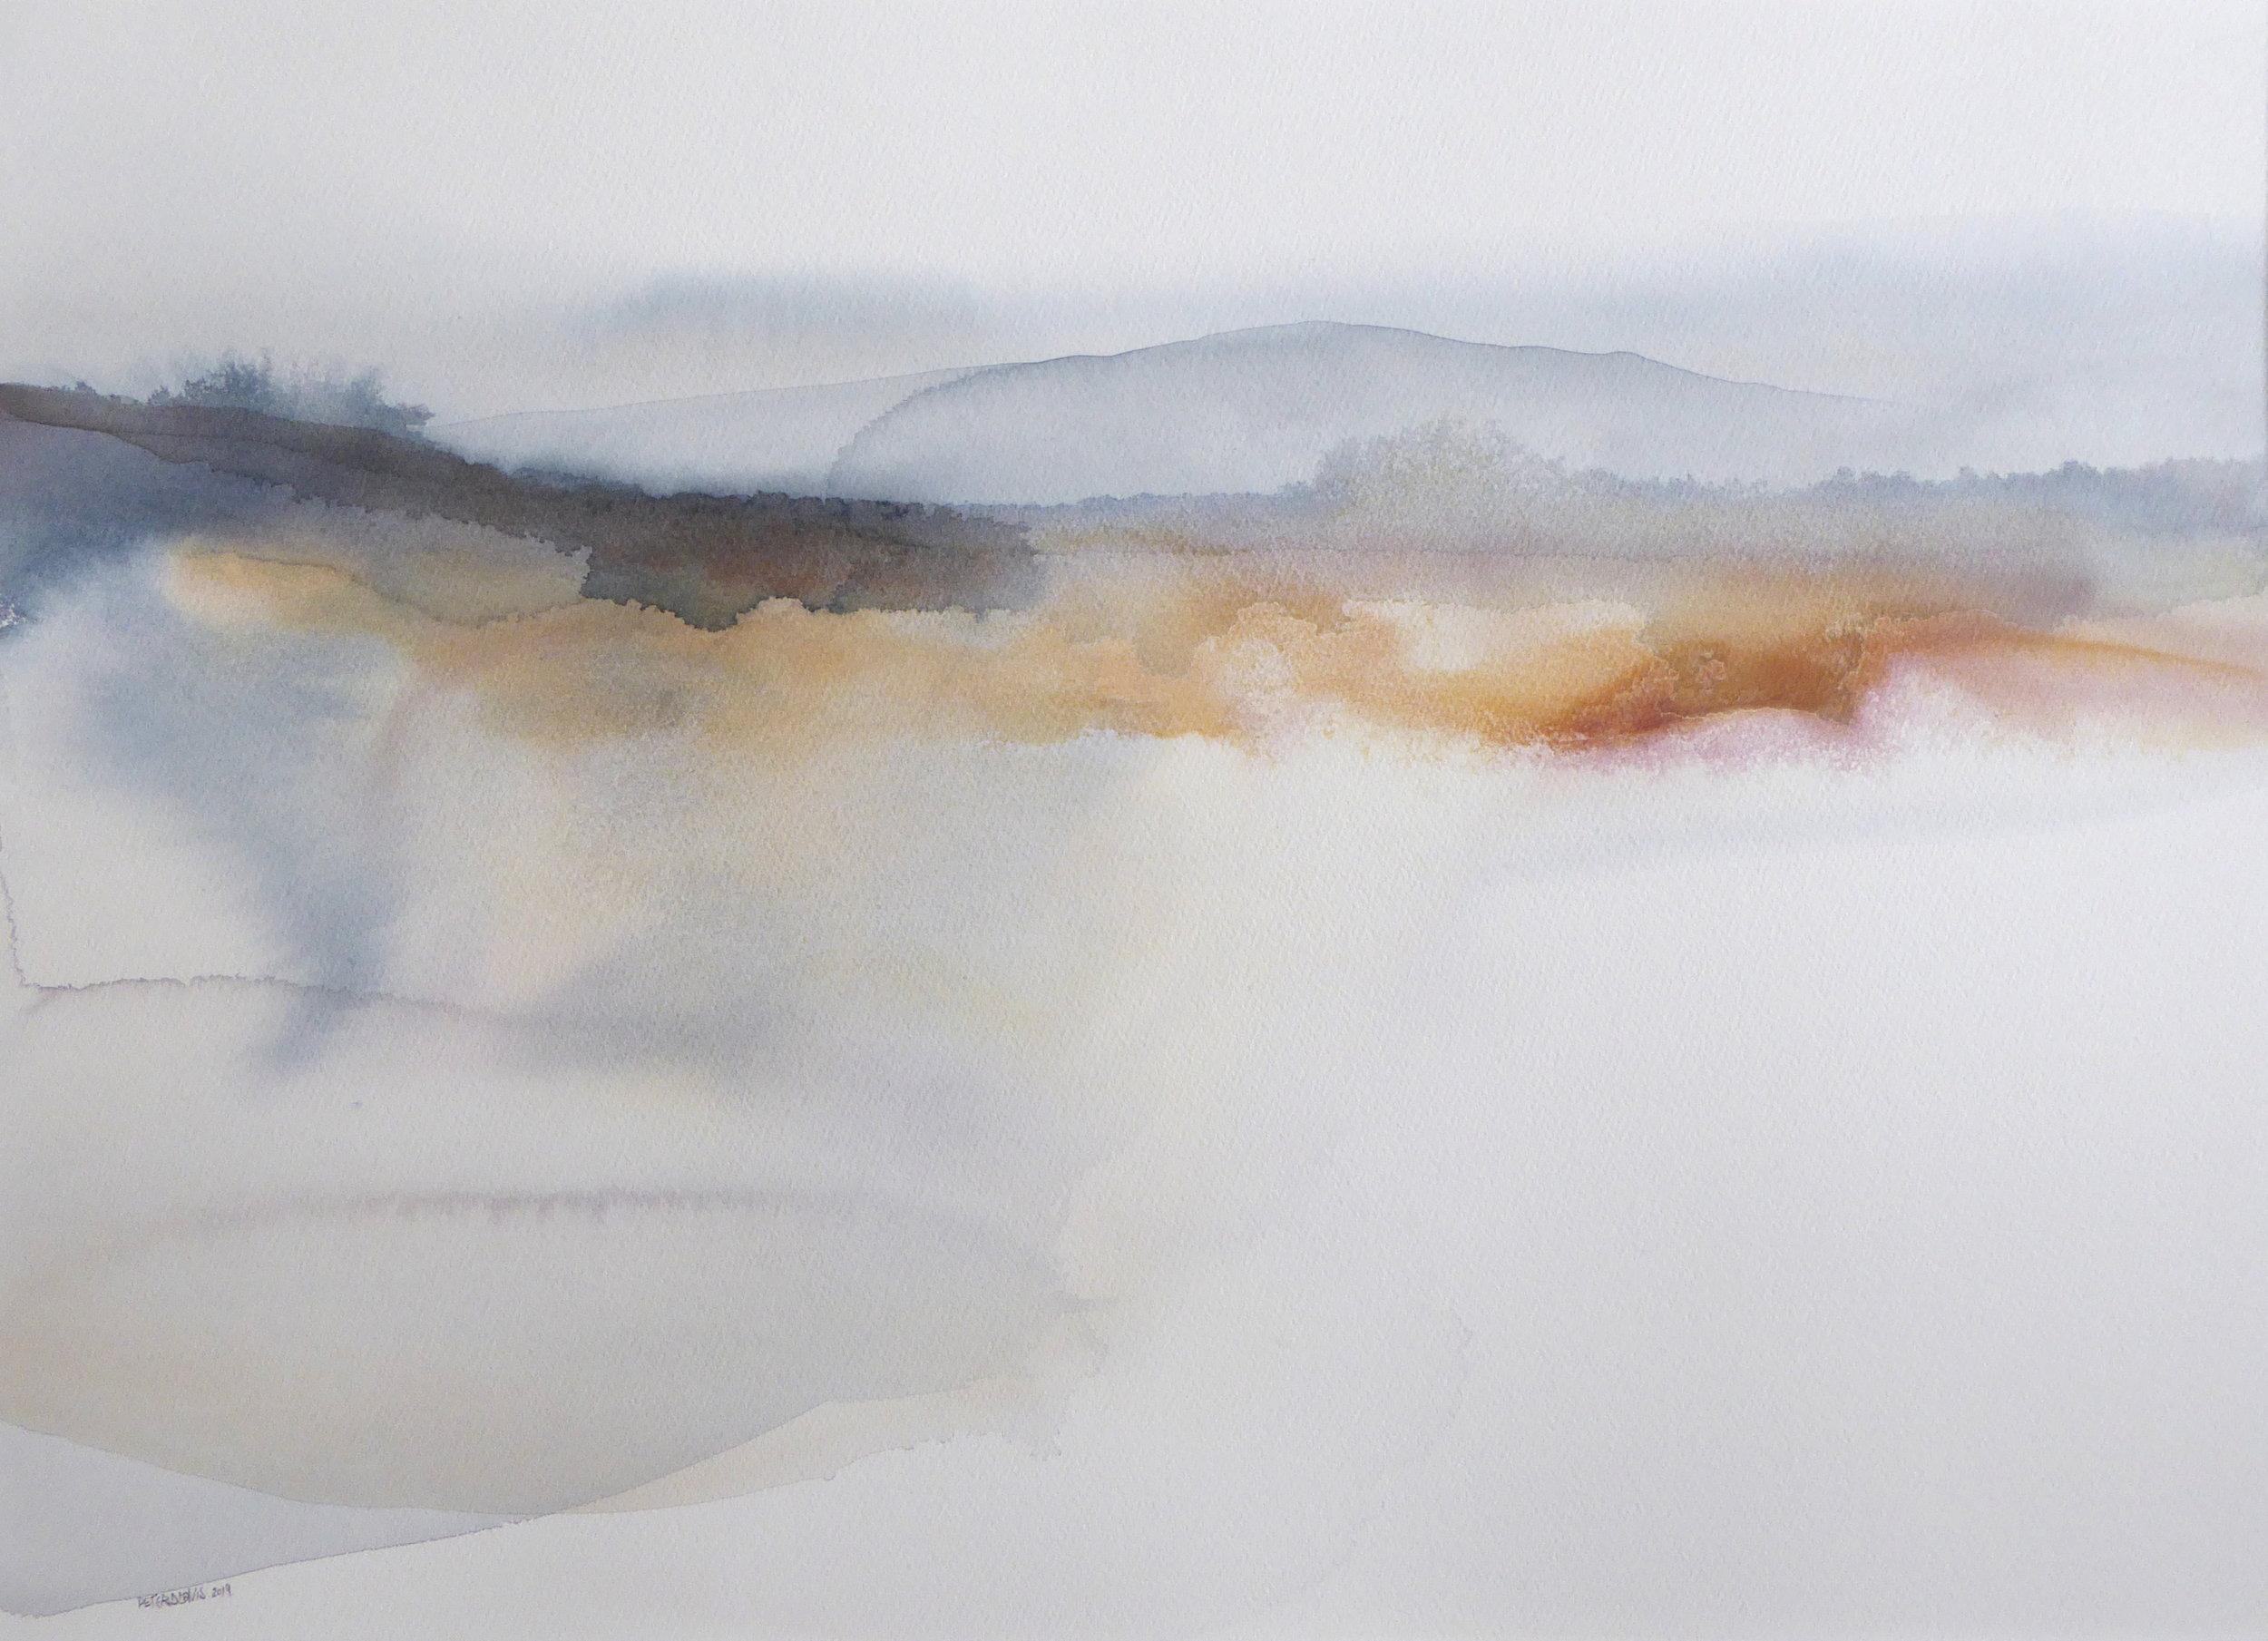 Mizzle, Peter Davis